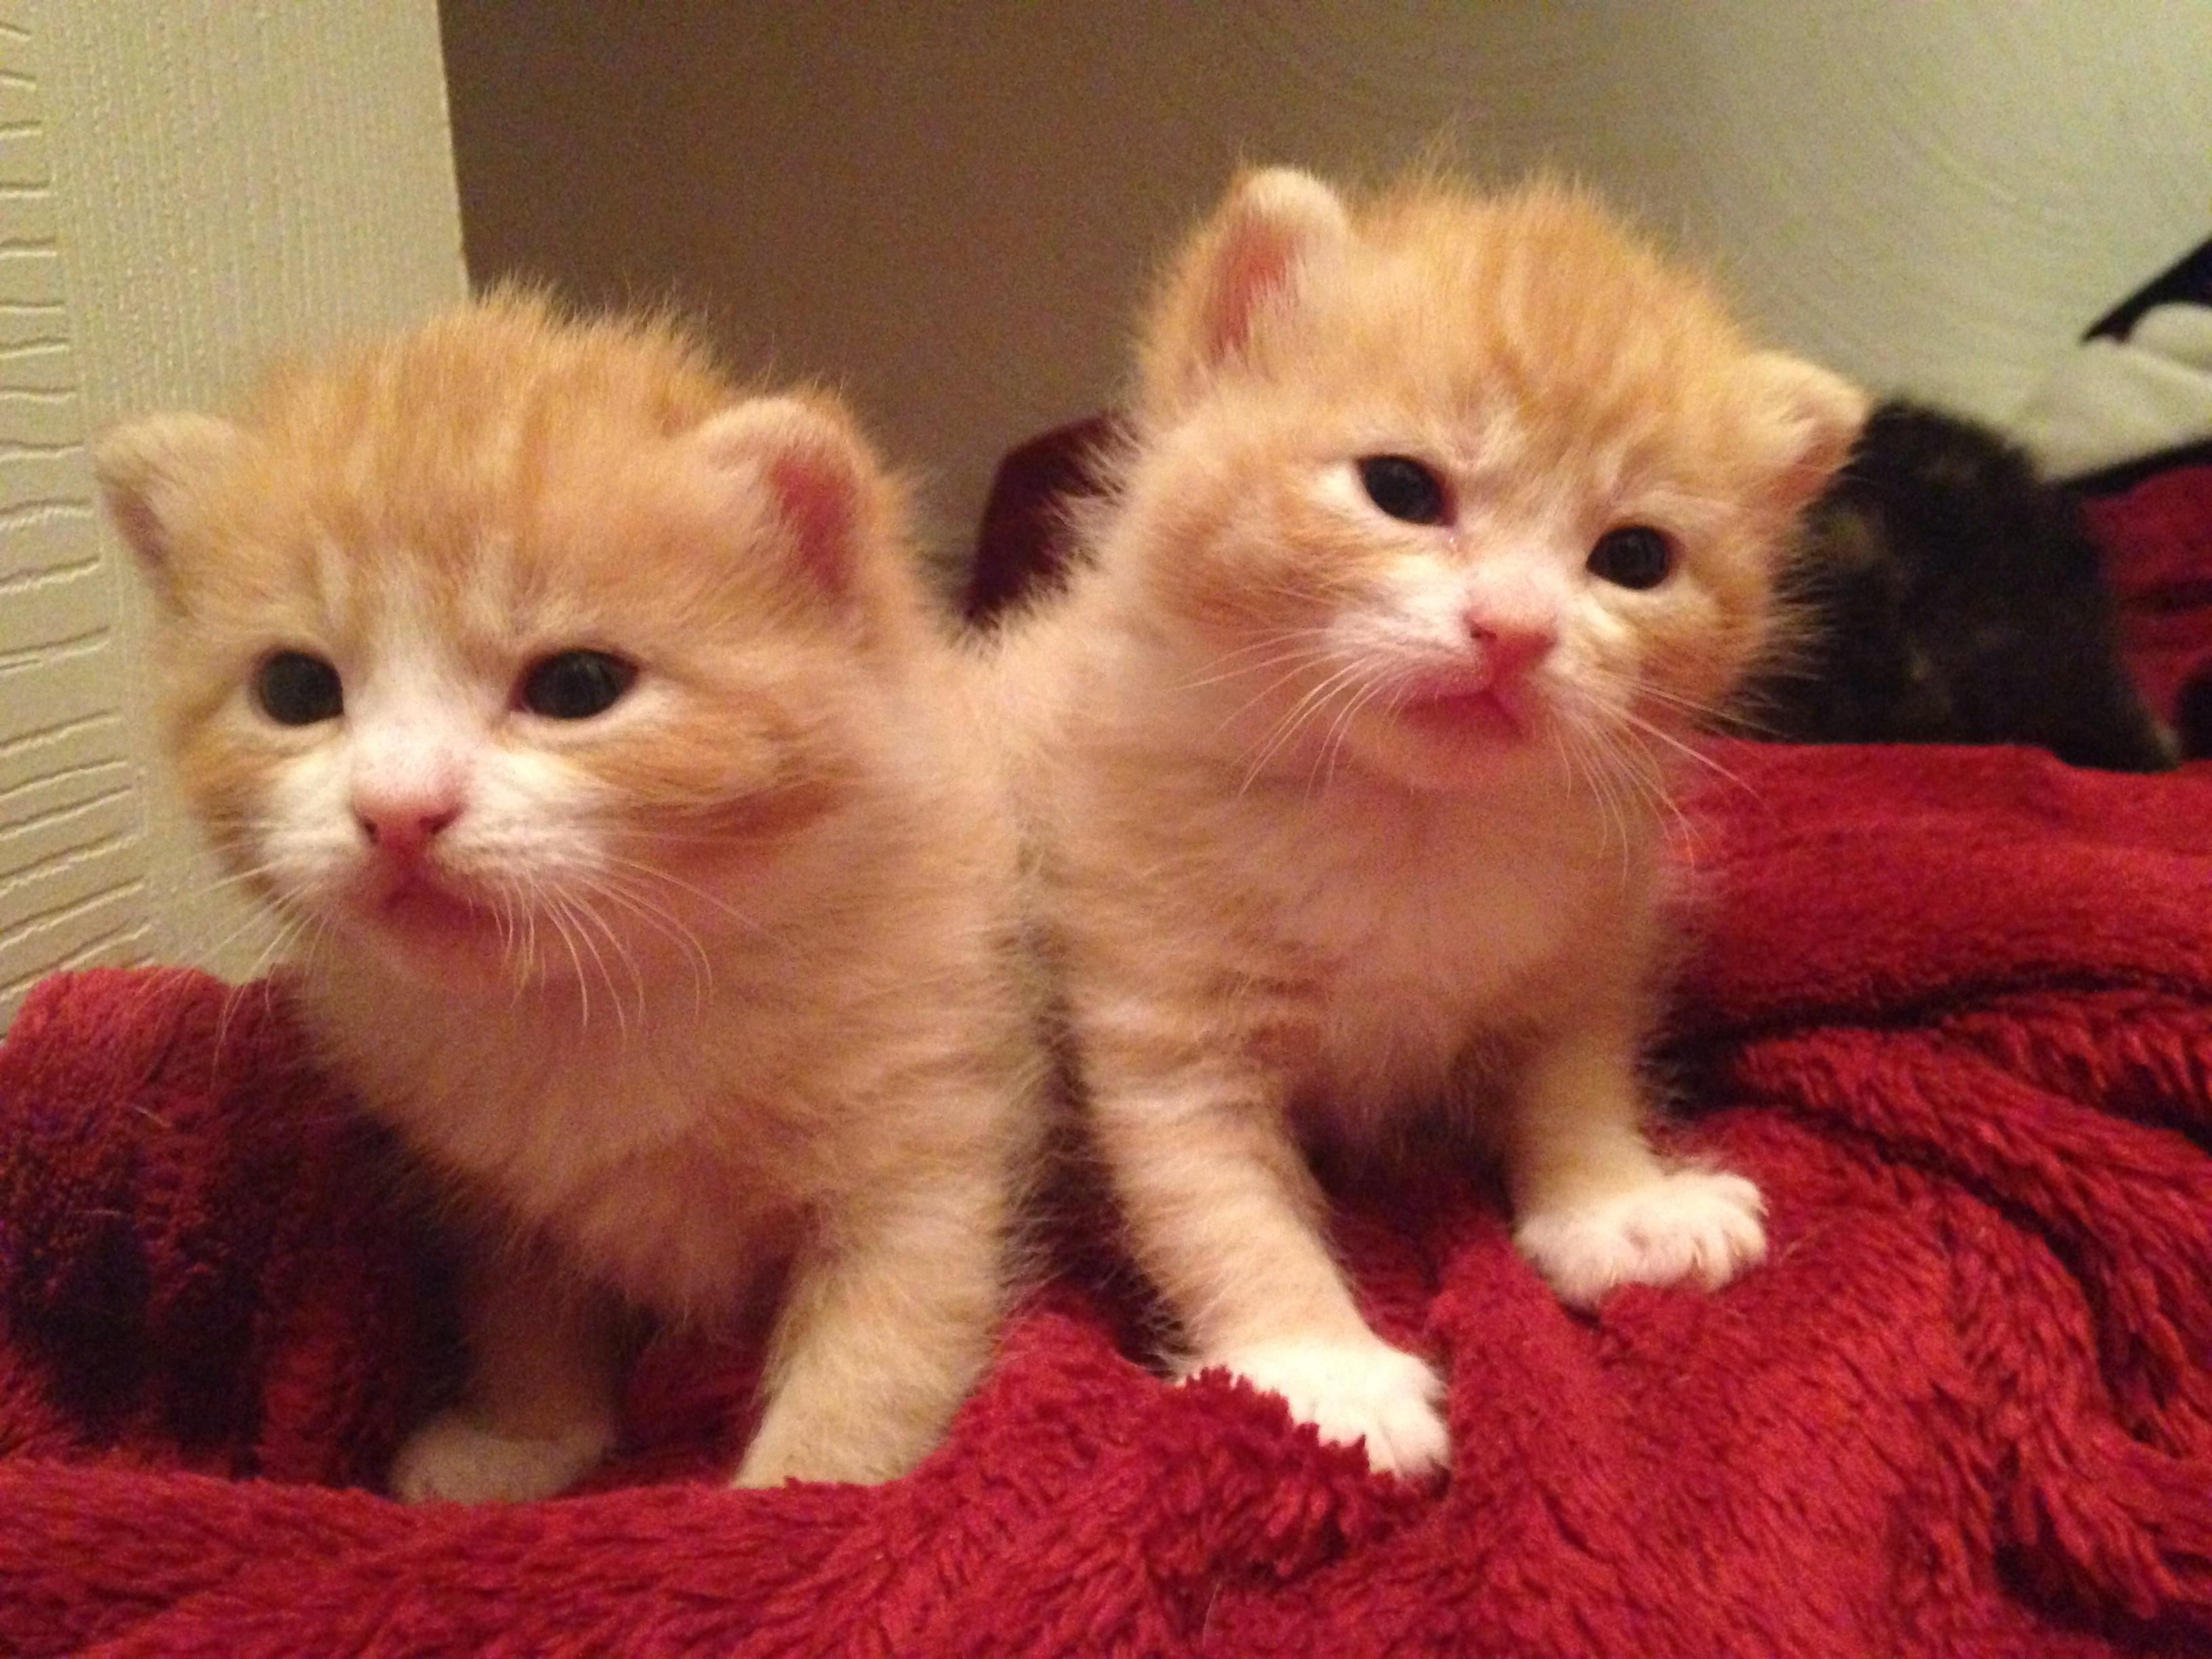 Identical Two Week Old Orange Baby Kittenshttps I Redd It Ifpdx3cnyhz01 Jpg Kittens Baby Animals Baby Kittens